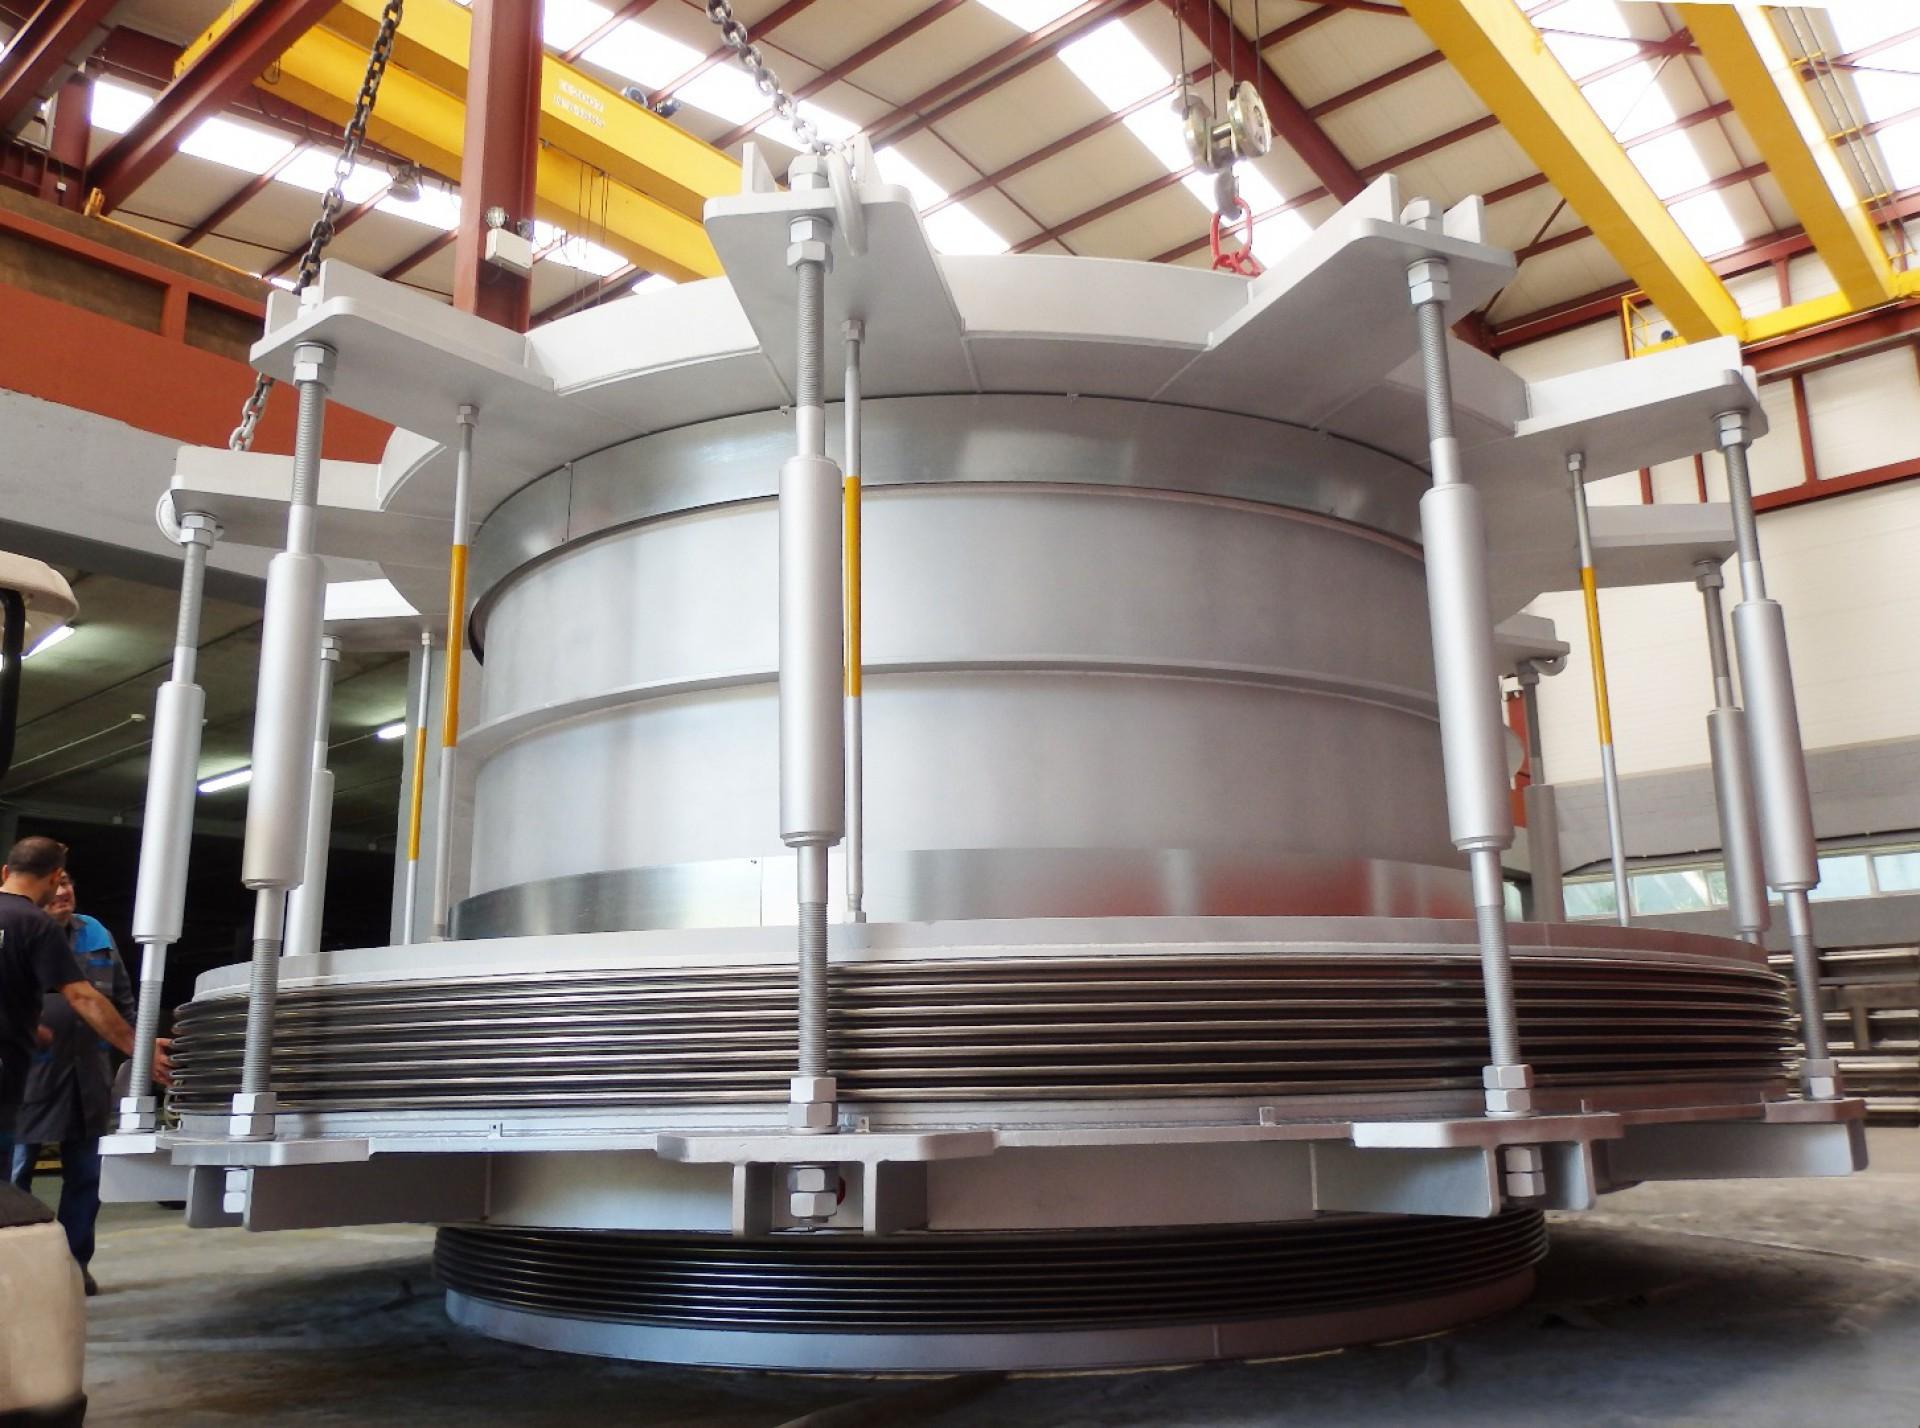 Large Inline Pressure Balanced for Ivory Coast power plant